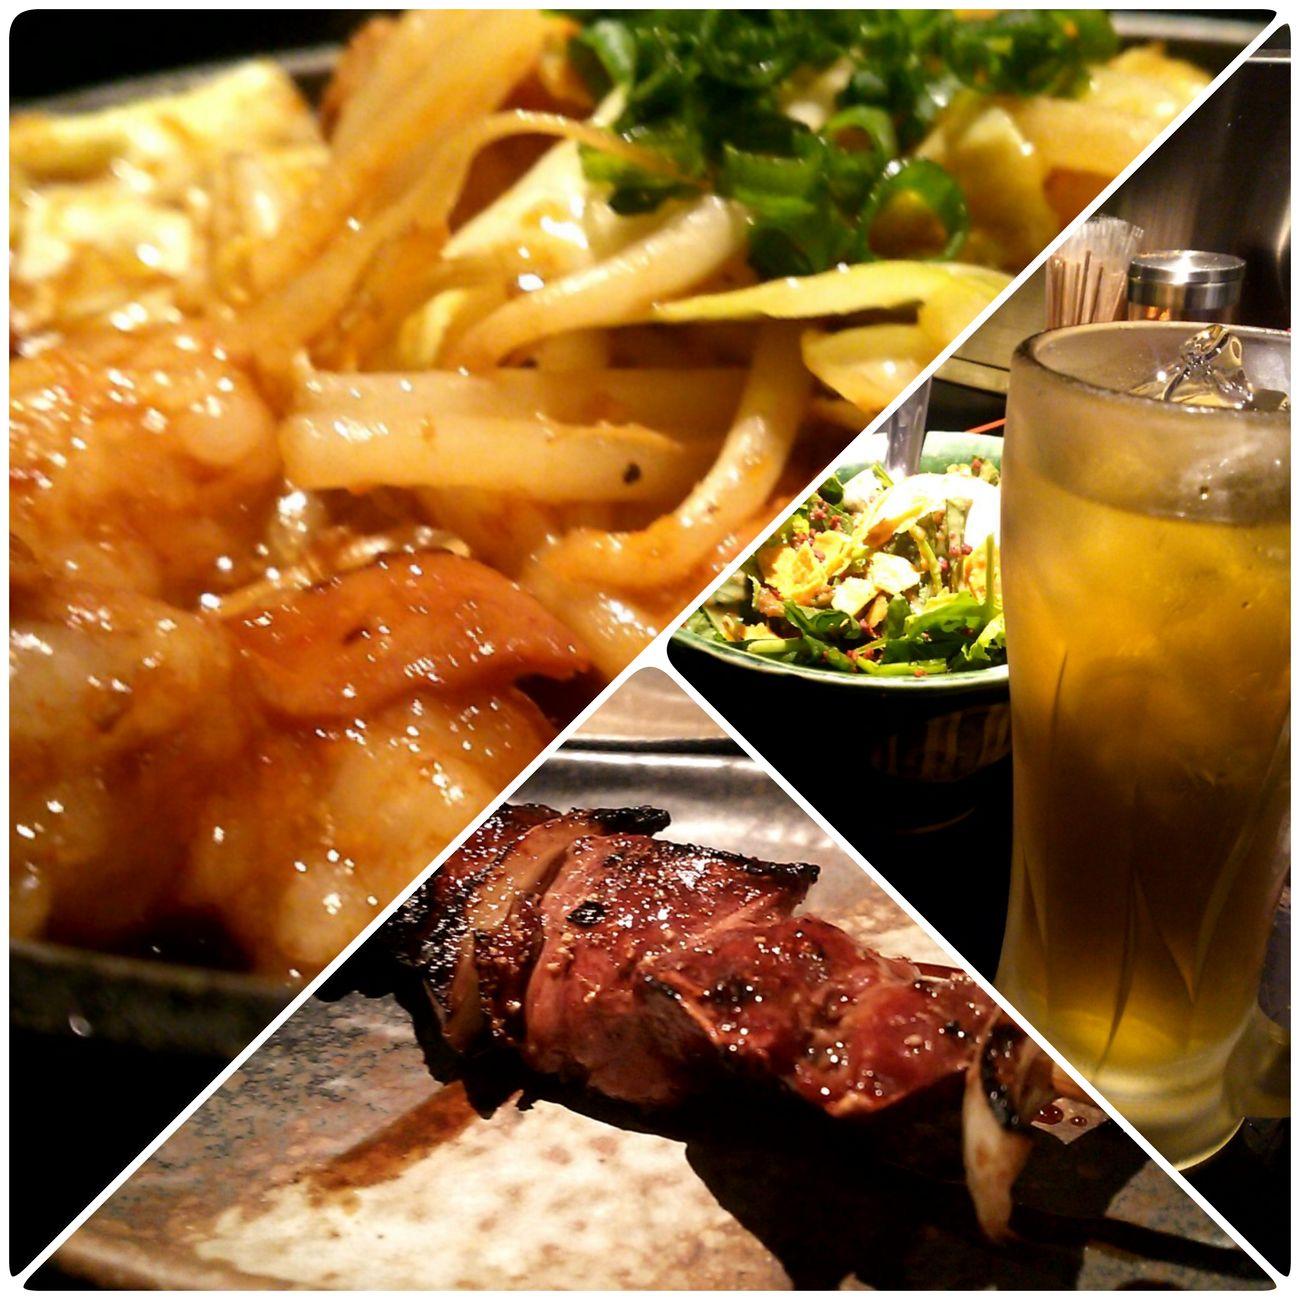 Food Porn In My Mouf Enjoying A Meal Enjoy A Meal Ikebukuro Tokyo Ikebukuro やきとり お酒 Hakata Motsuni 店名\(°Д° )/忘れました 牛モツのぷりぷり鉄板煮、レバー、ちょいとサラダとお酒です(´艸`)ウマー